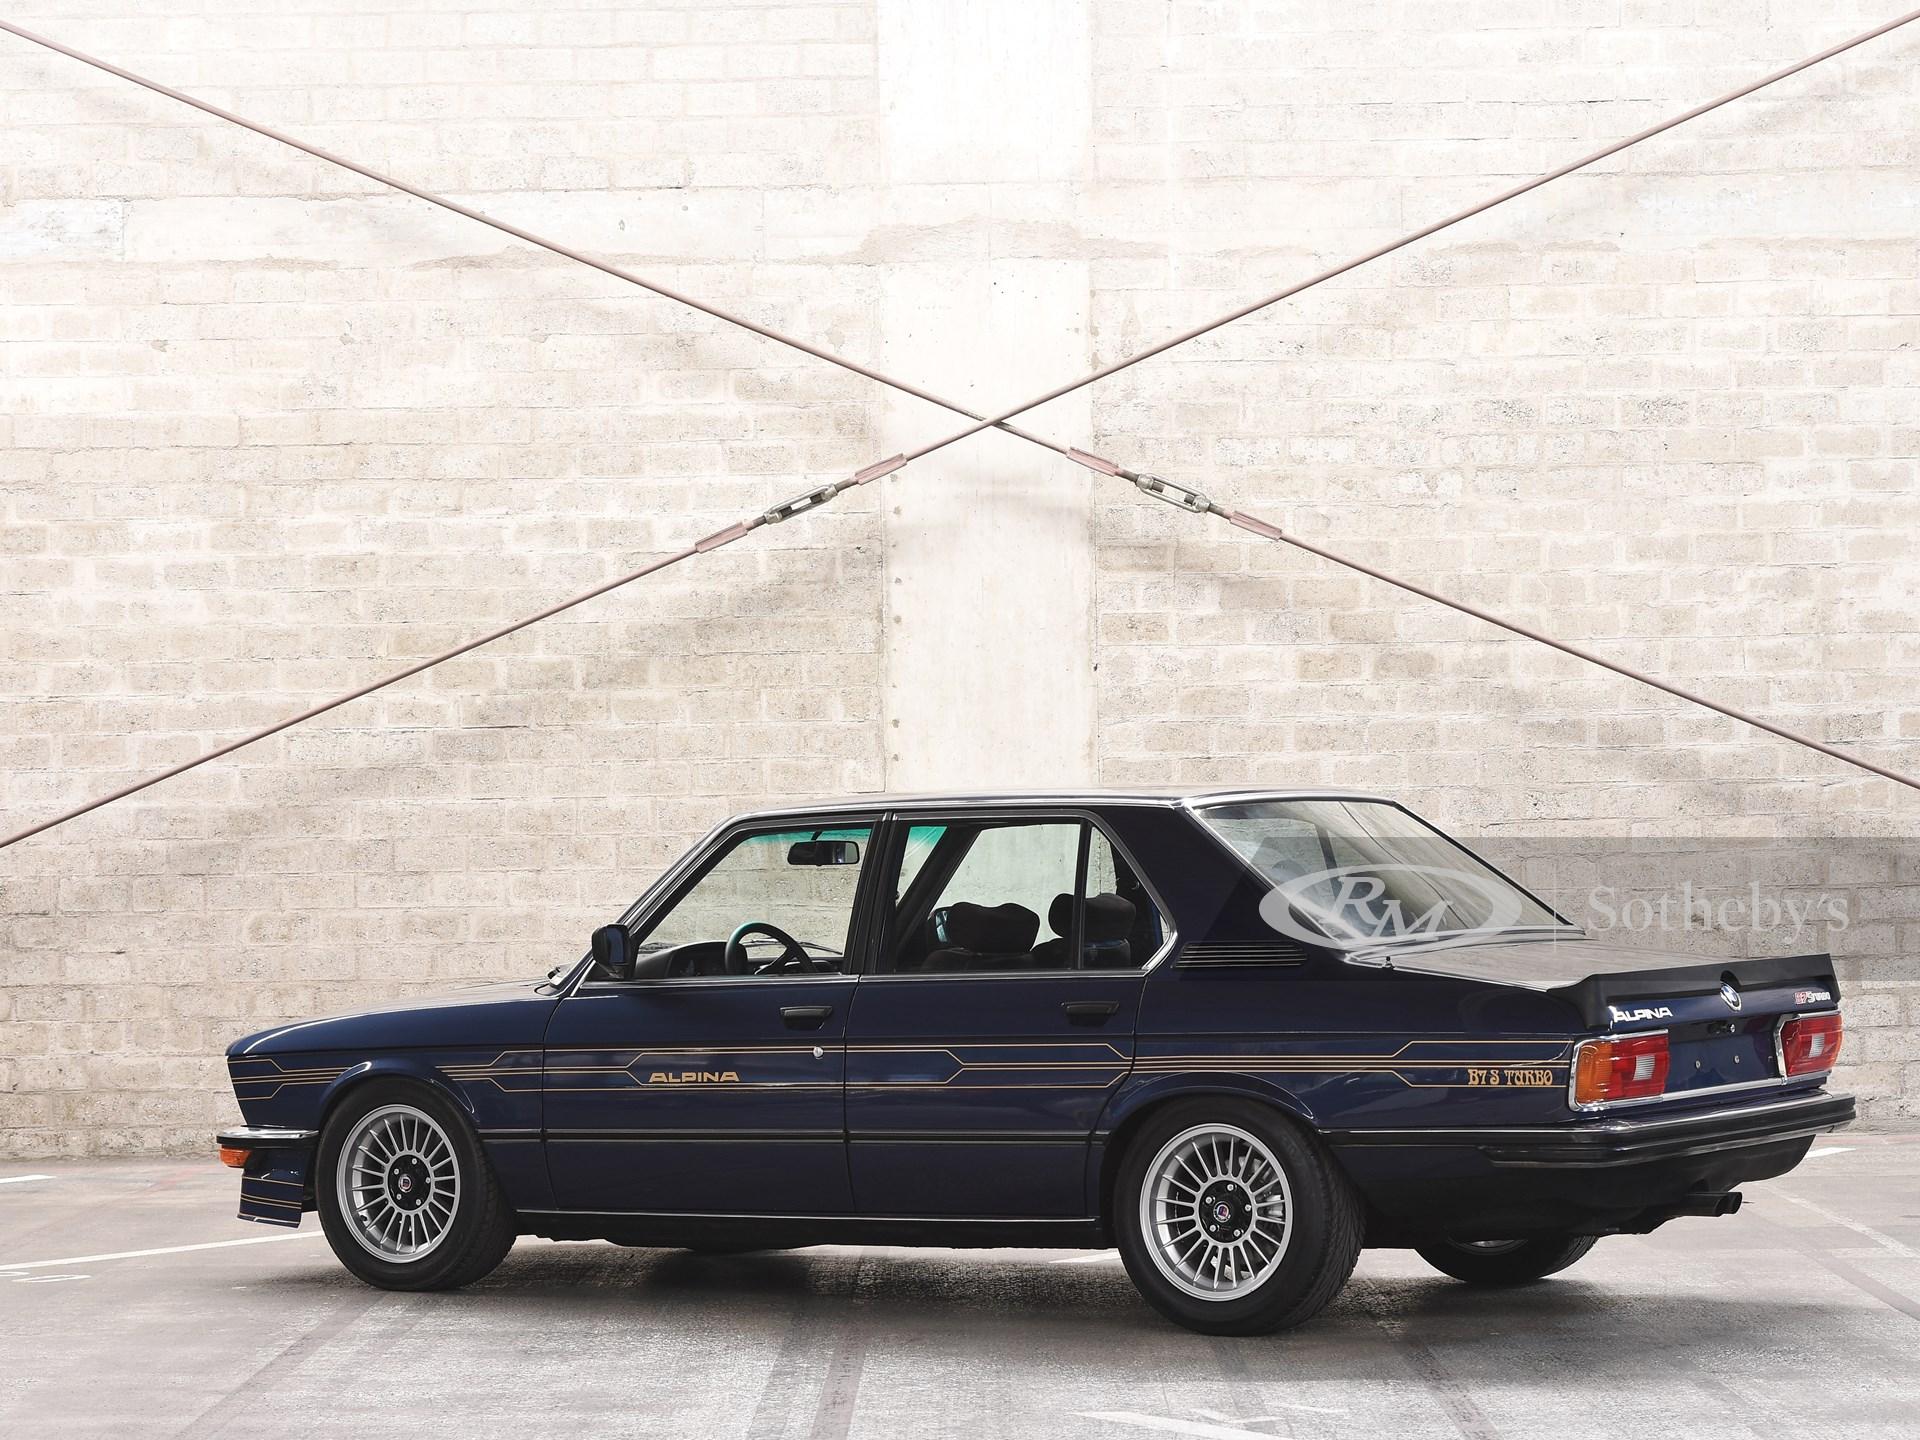 1982 BMW Alpina B7 S Turbo  -